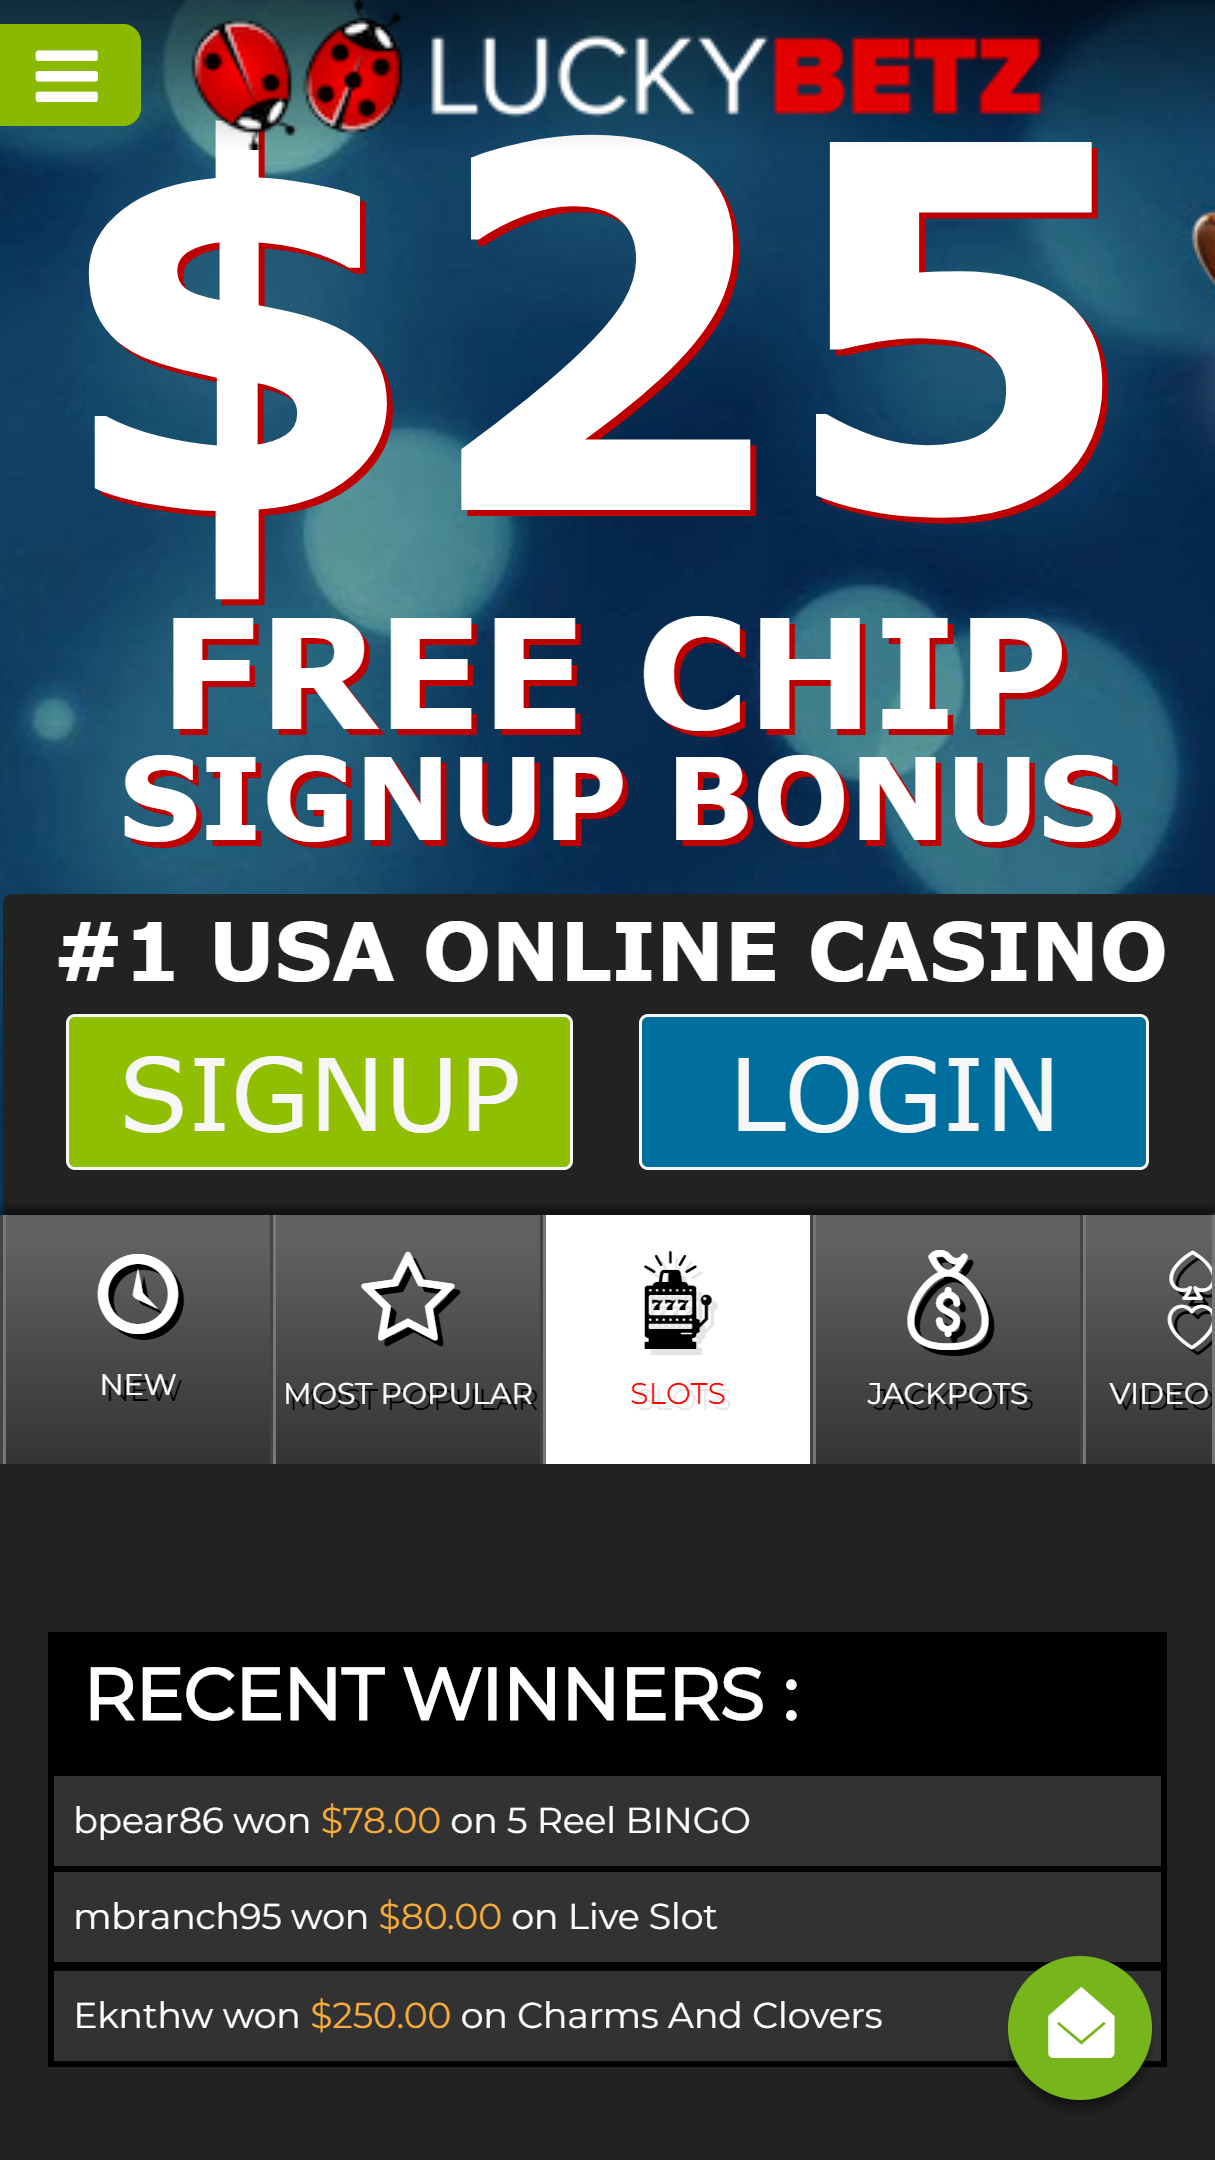 LuckyBetz Casino App Homepage